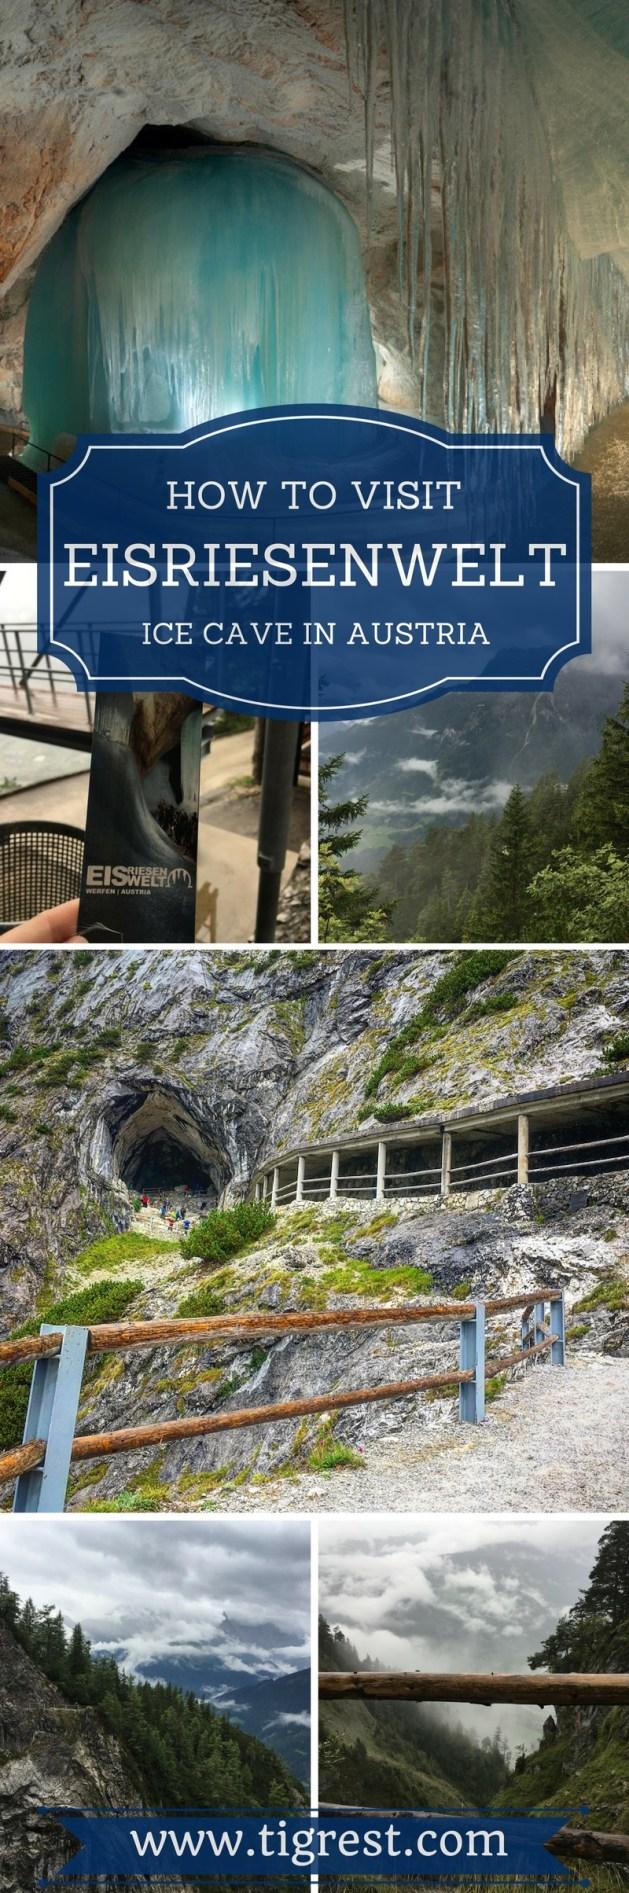 eisriesenwelt ice cave pinterest